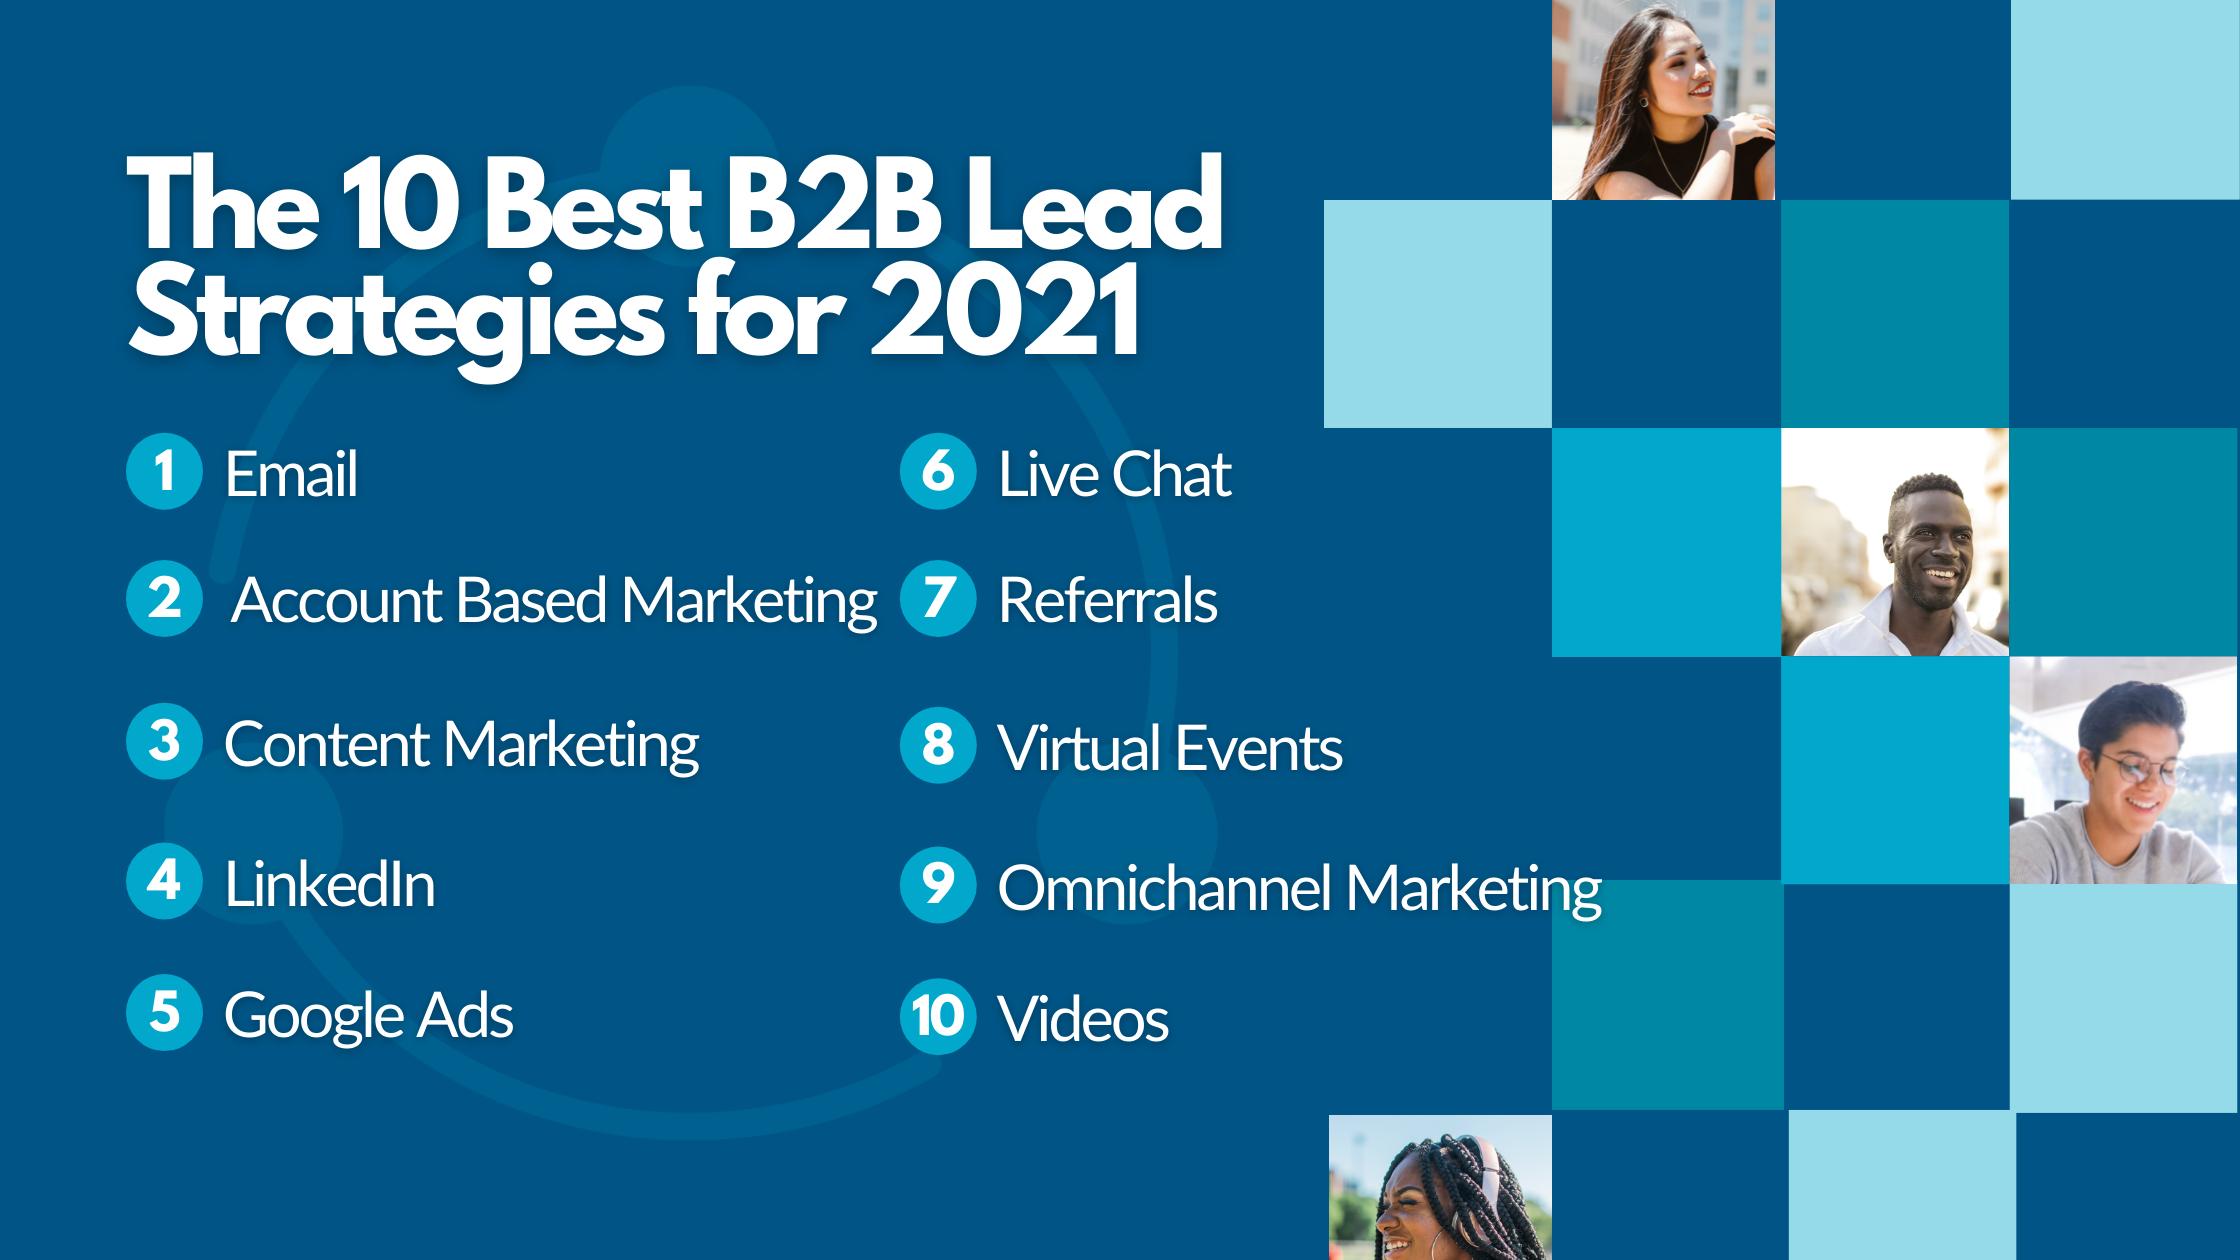 10-best-b2b-lead-strategies-for-2021